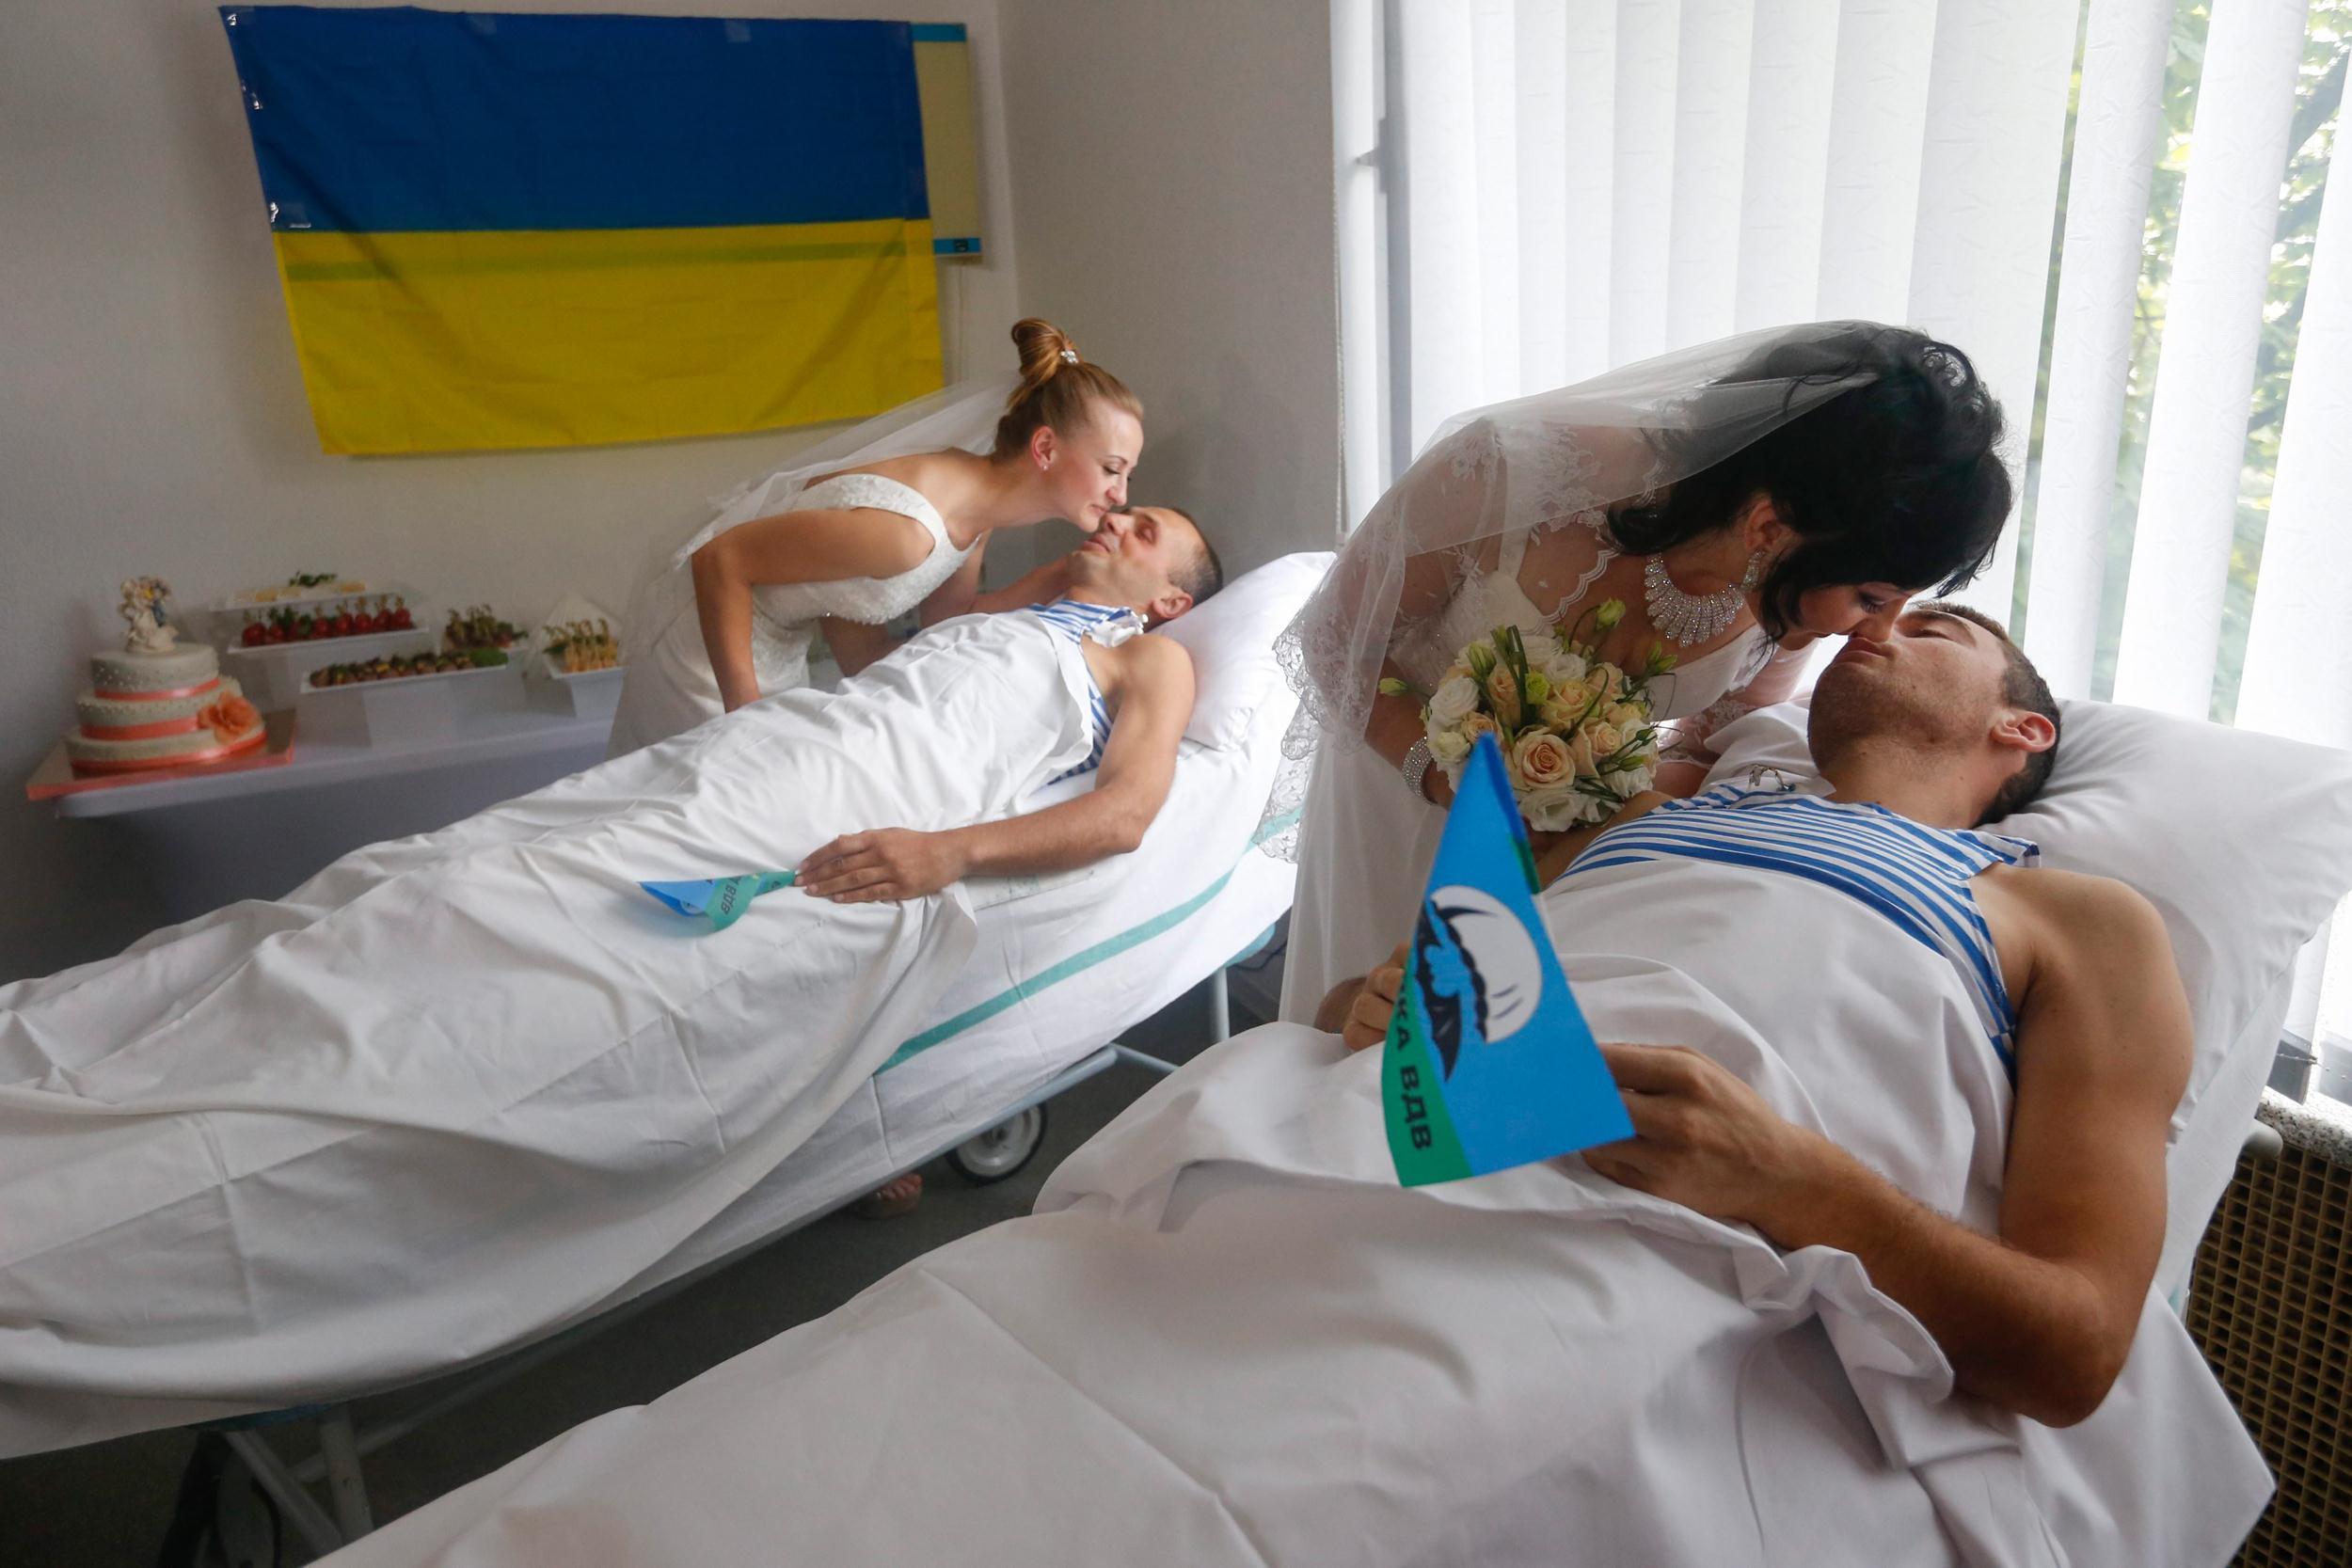 Read More Russian Brides 113